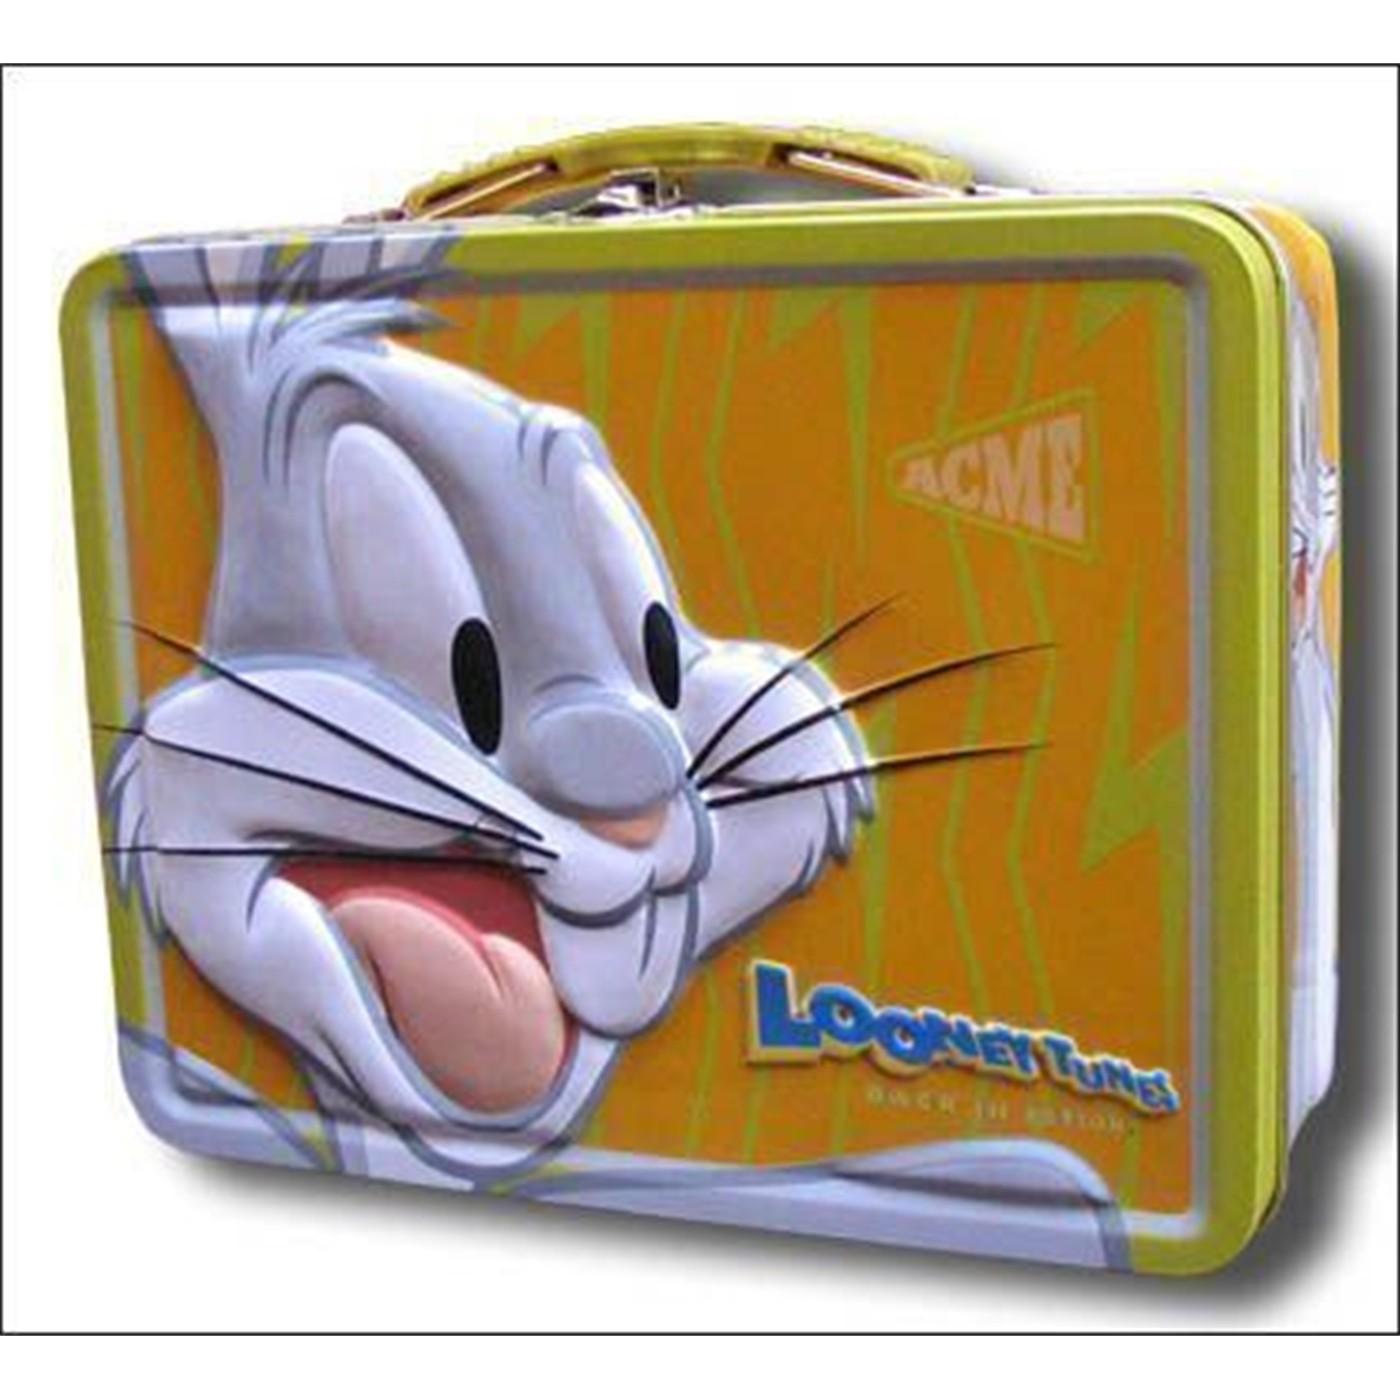 Bugs Bunny Lunchbox